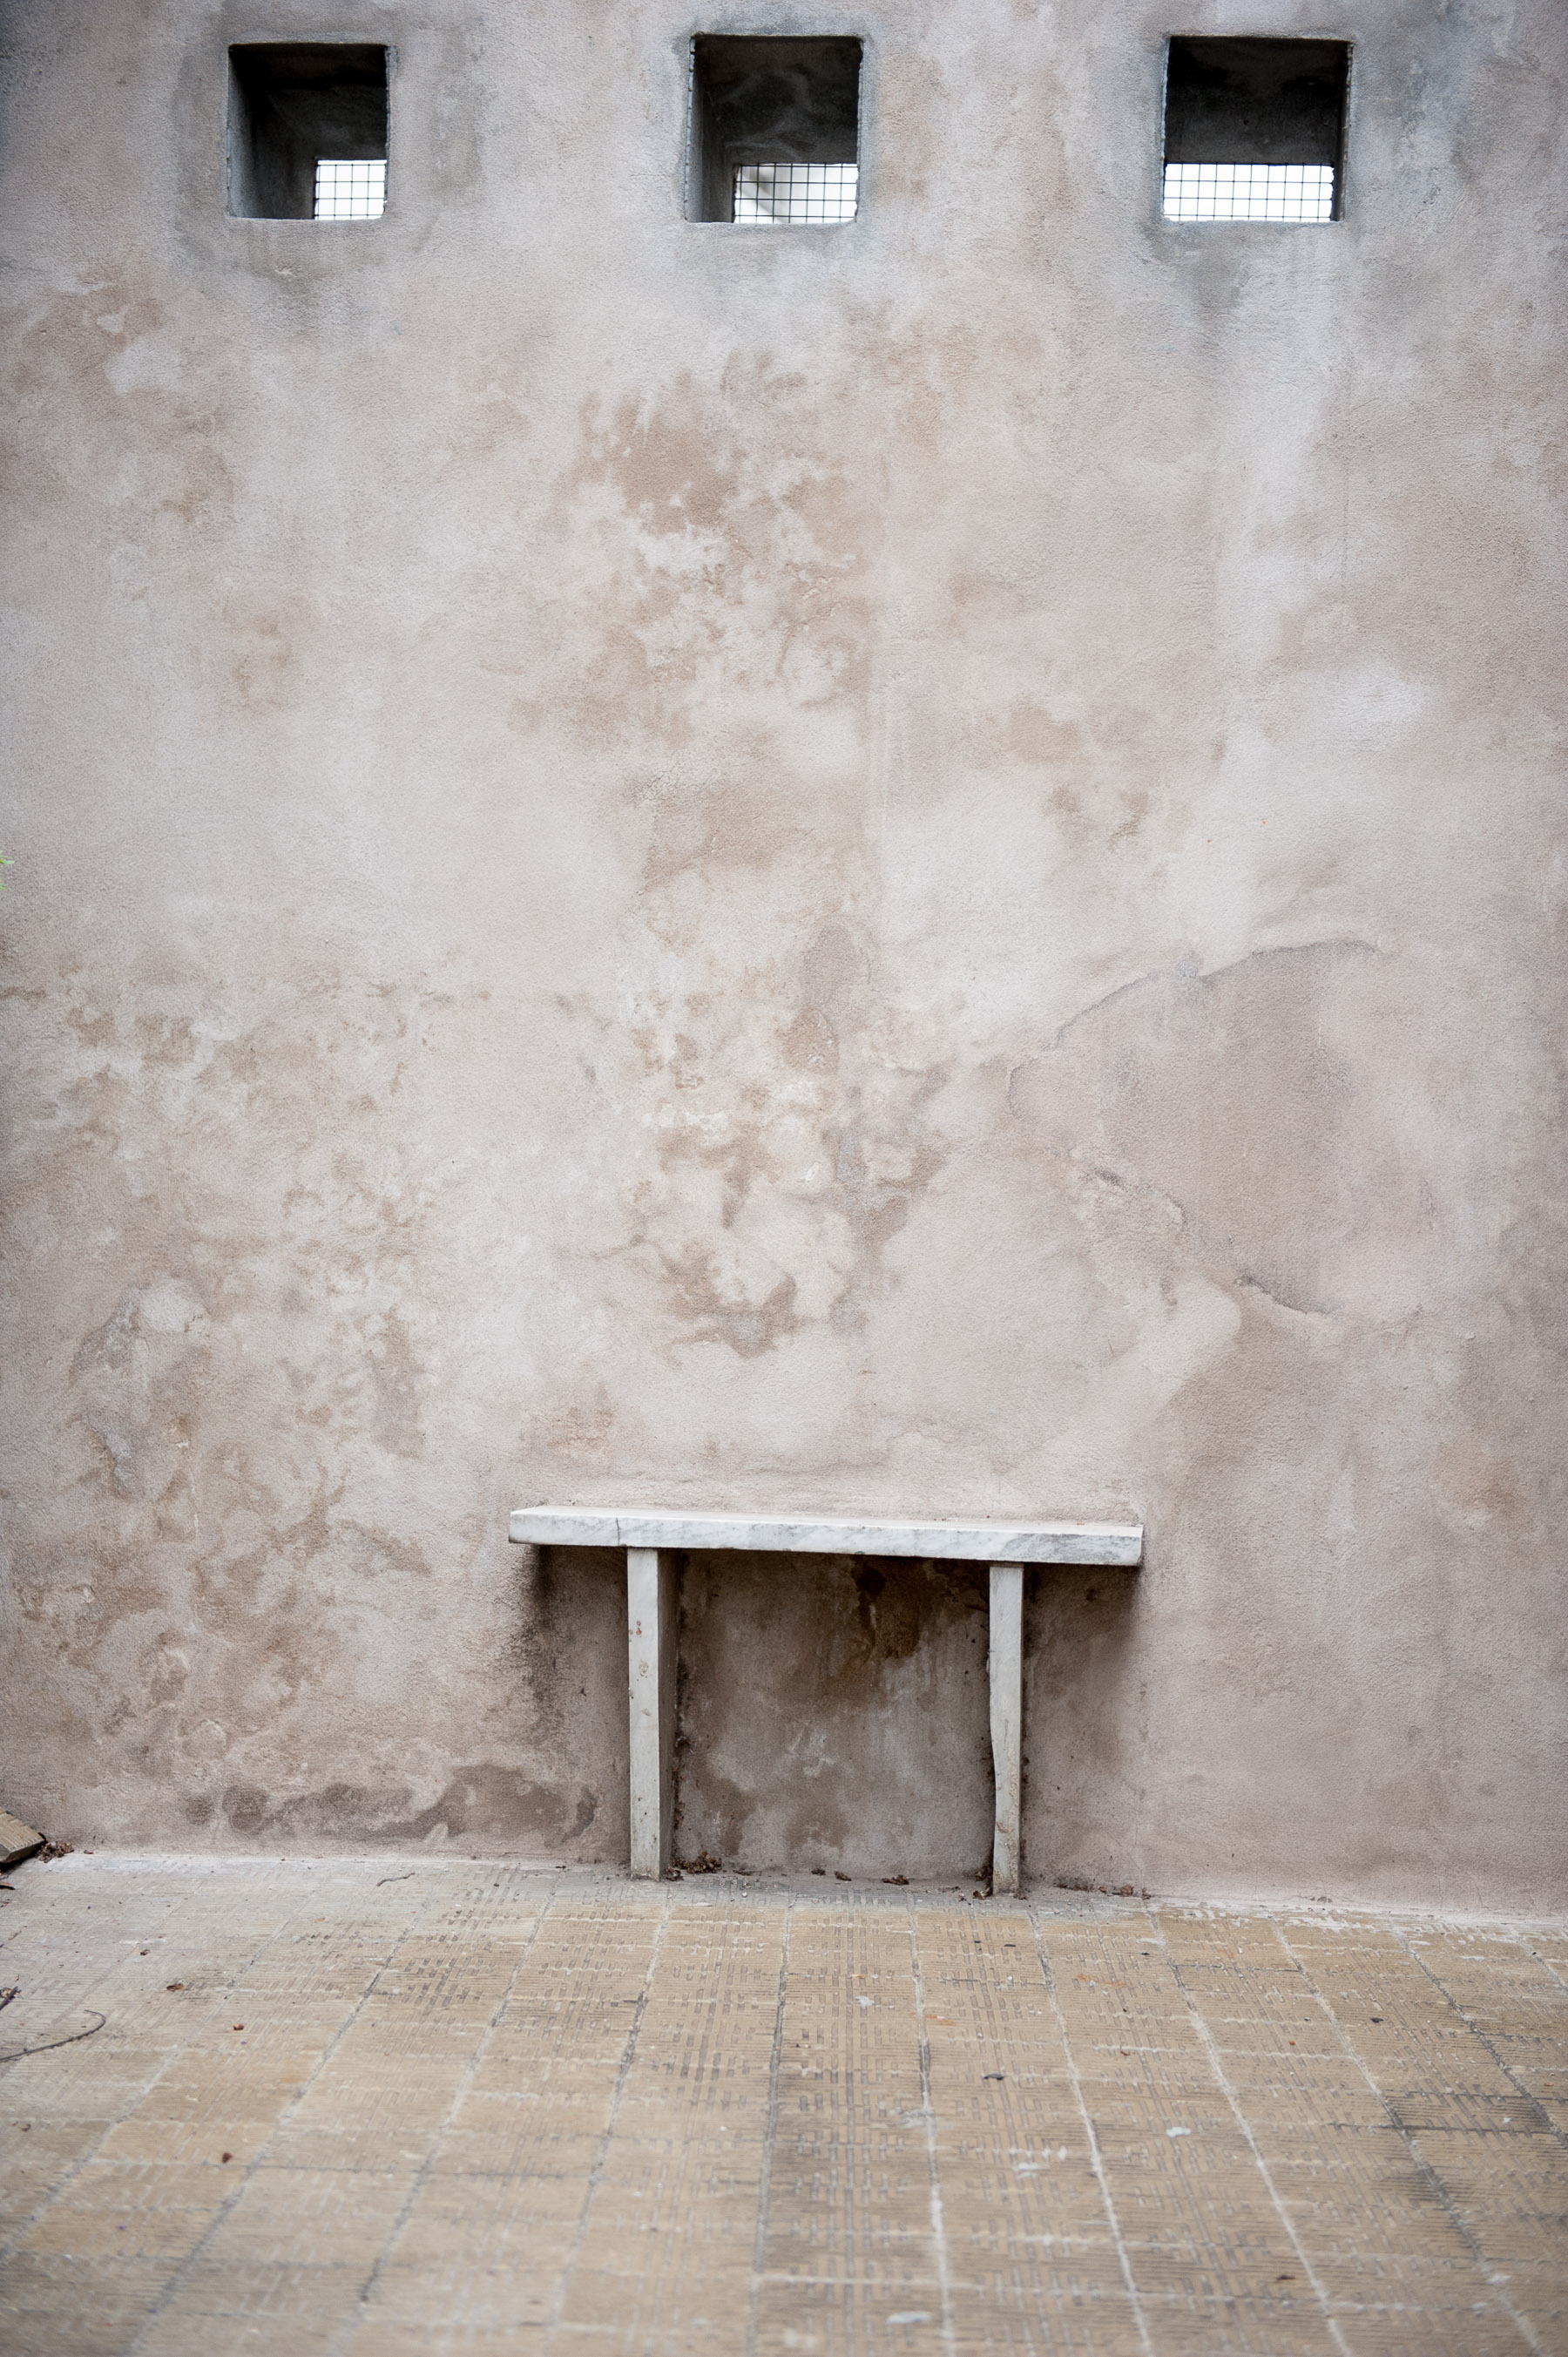 patricia-vanrespaille-photographer-life-through-my-lens-026.jpg